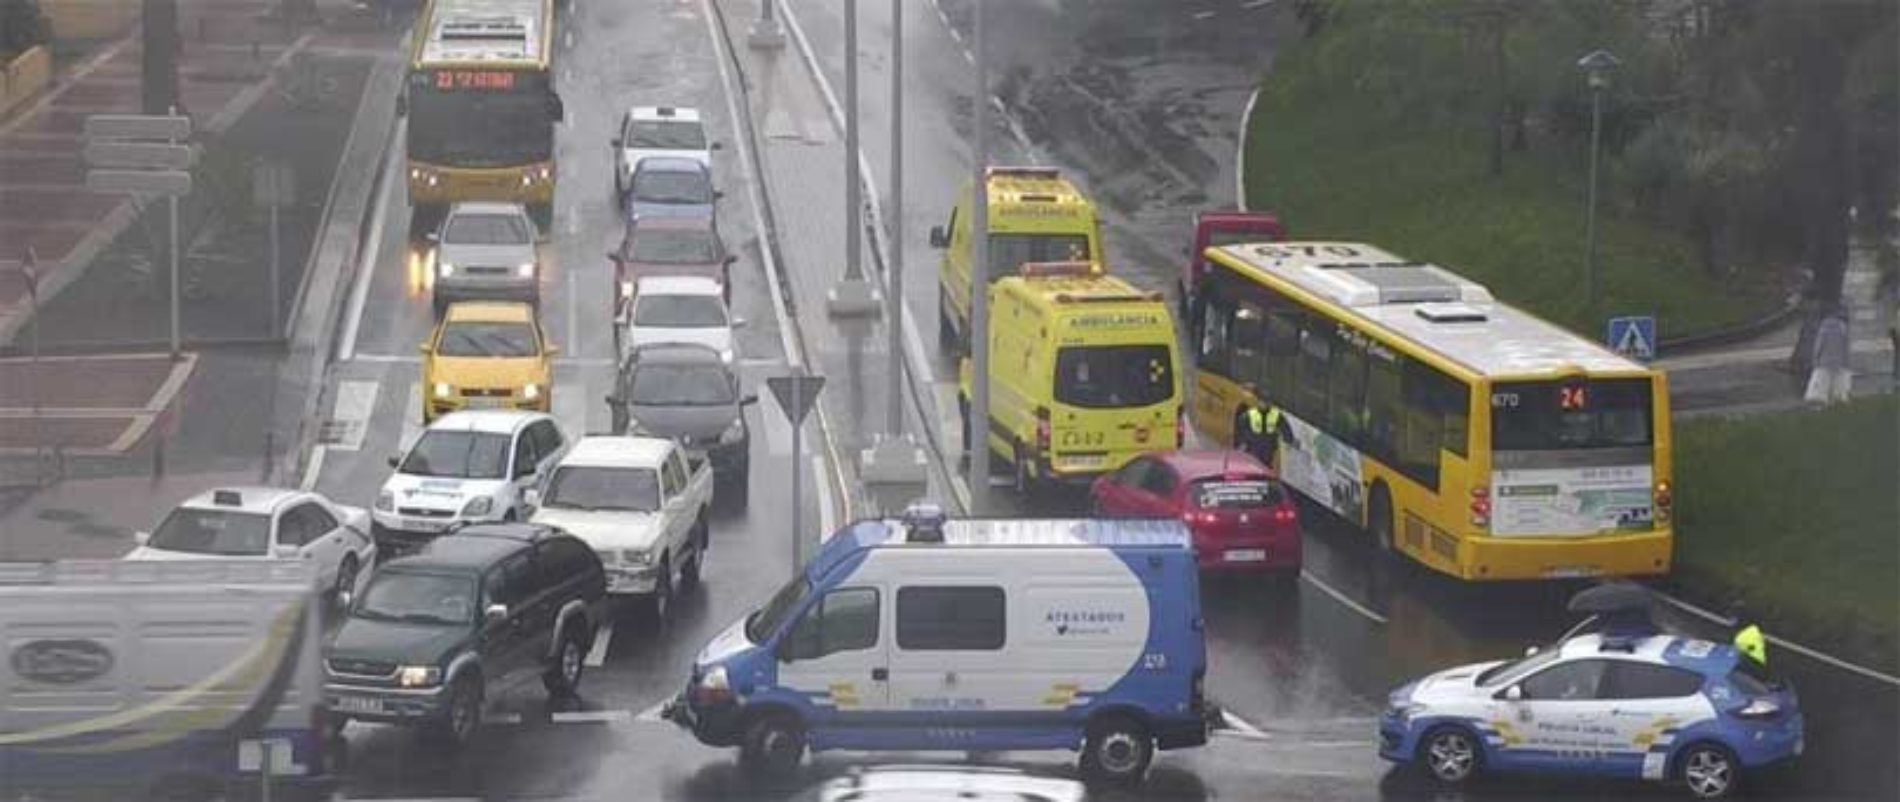 Regnet forårsaker flere ulykker i Las Palmas